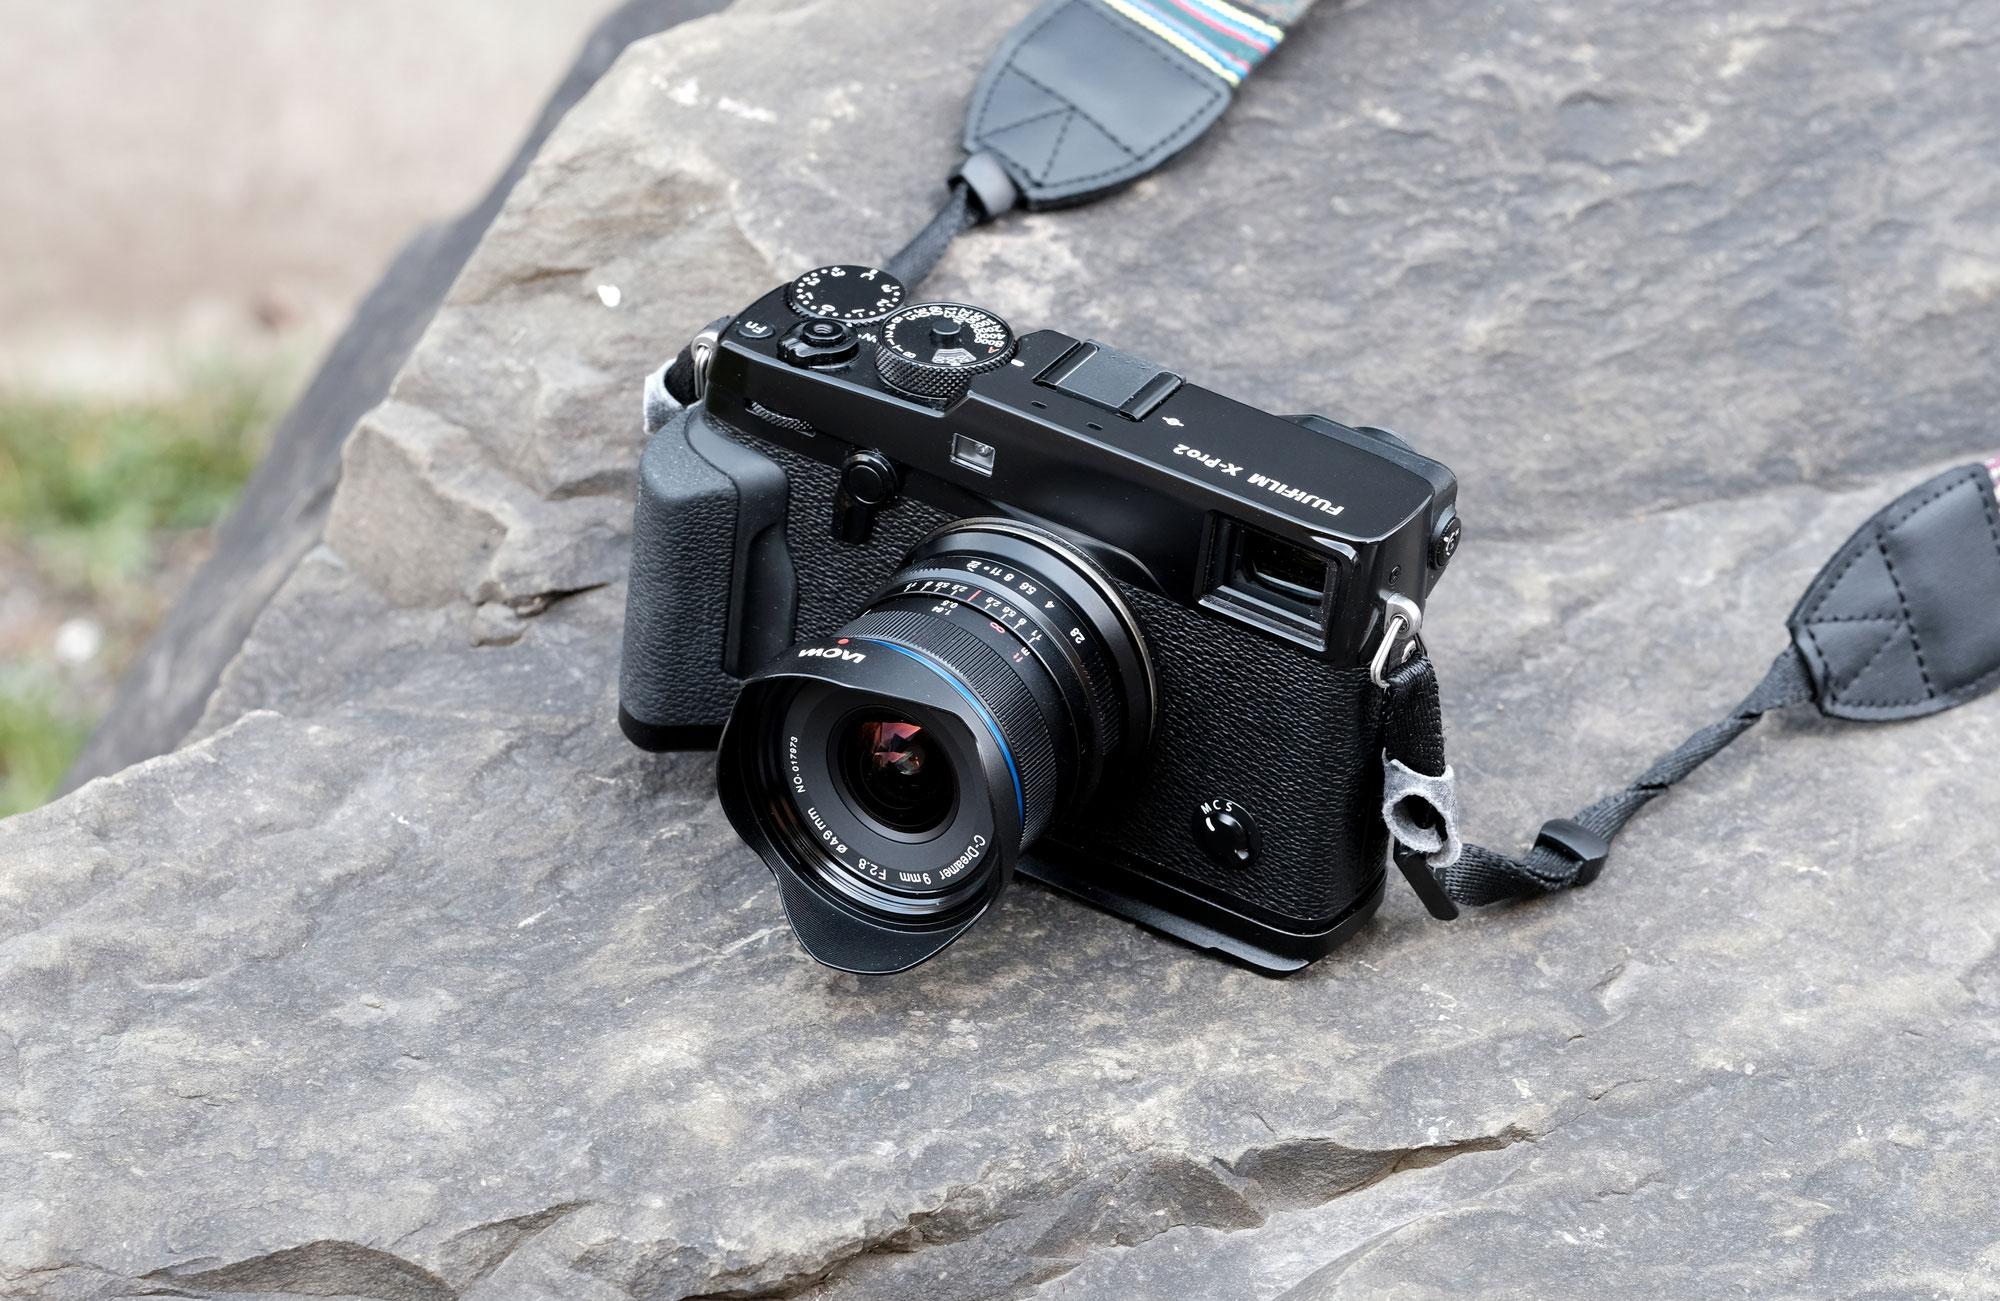 Testbericht: Laowa 9mm f2.8 für Fuji APS-C